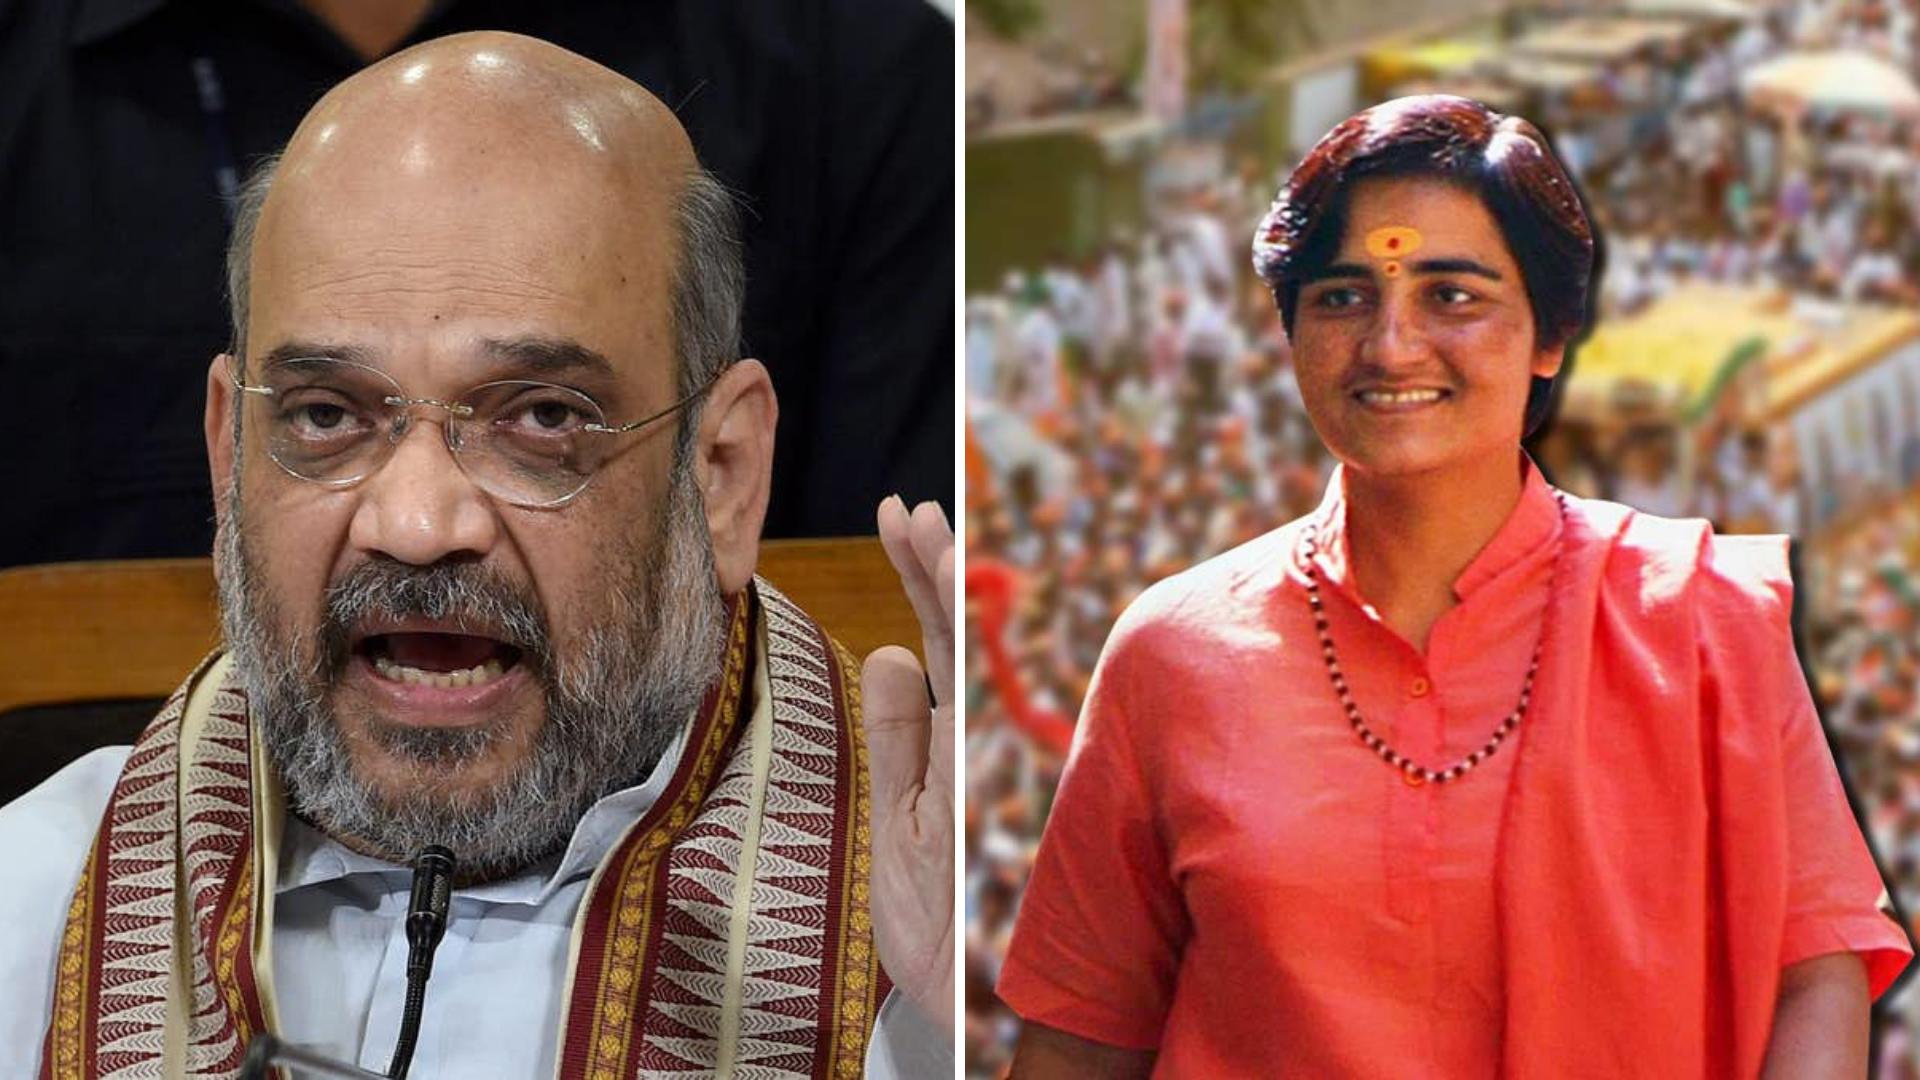 A Hindu Can Never Be A 'Terrorist': Amit Shah Backs Pragya Thakur